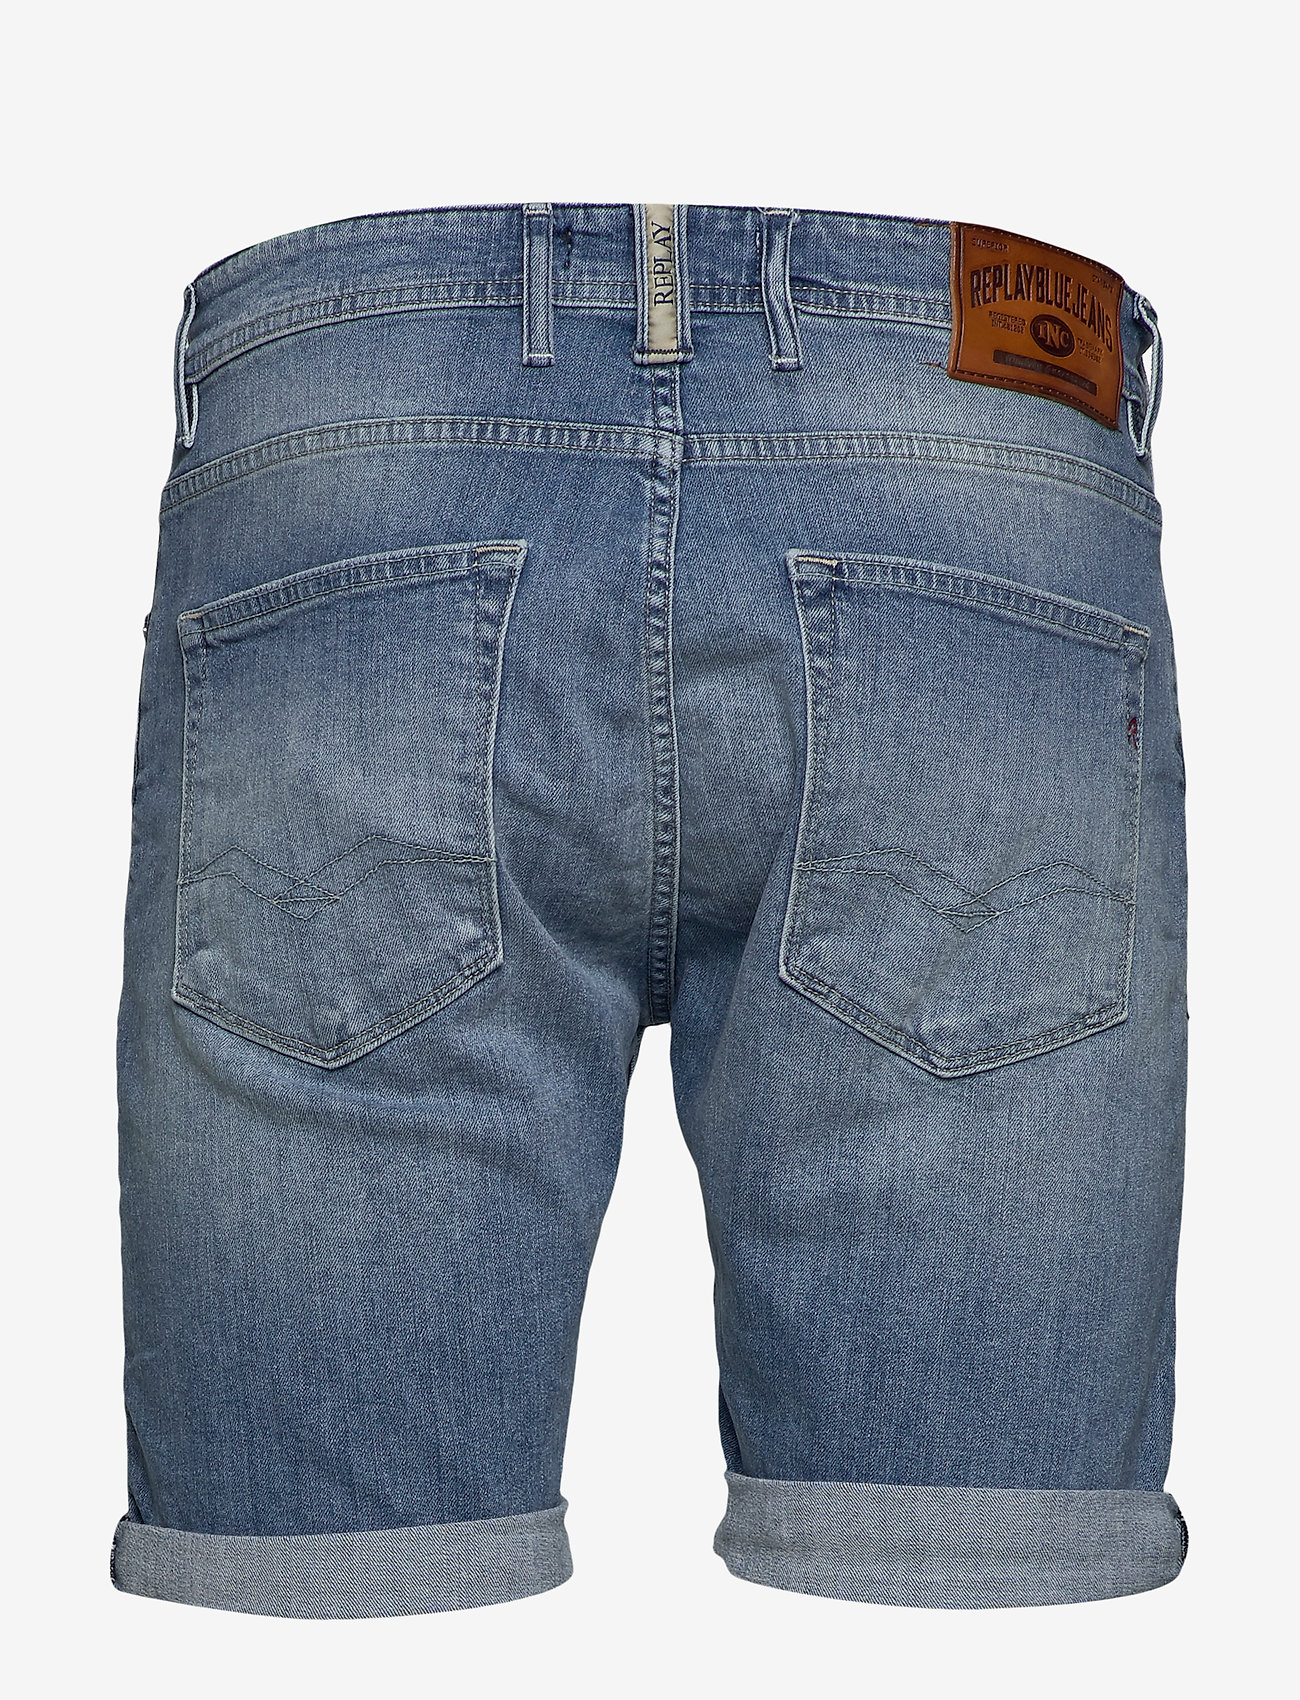 Replay - RBJ.901 SHORT - denim shorts - blue - 1